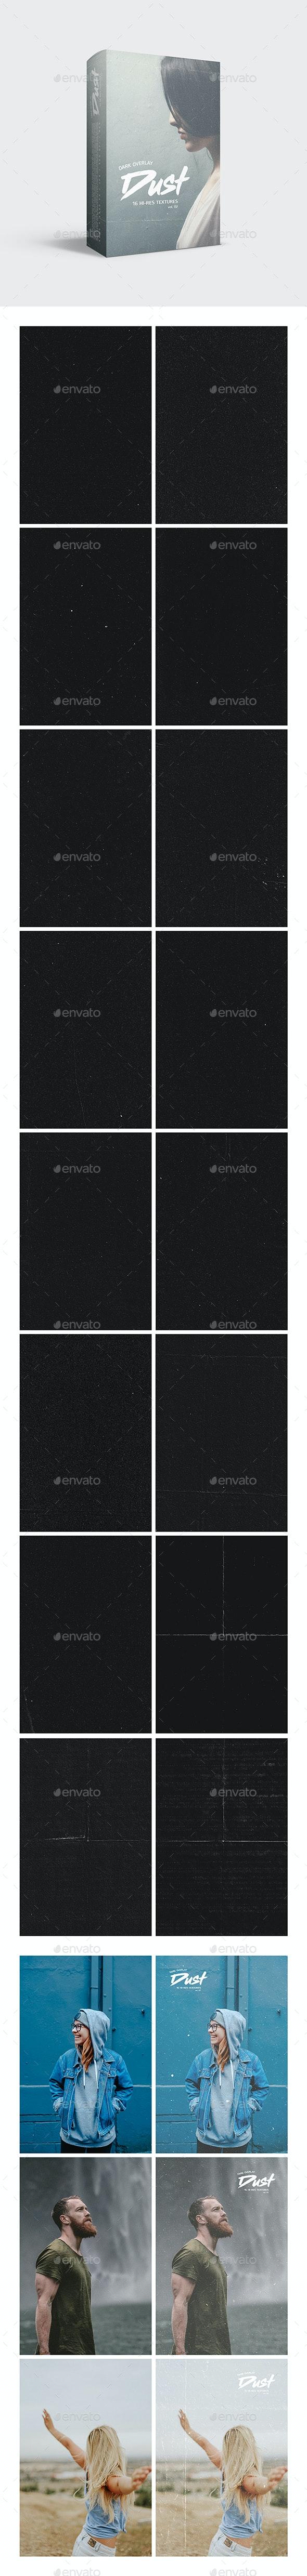 Dust Textures - Vol. 02 - Paper Textures